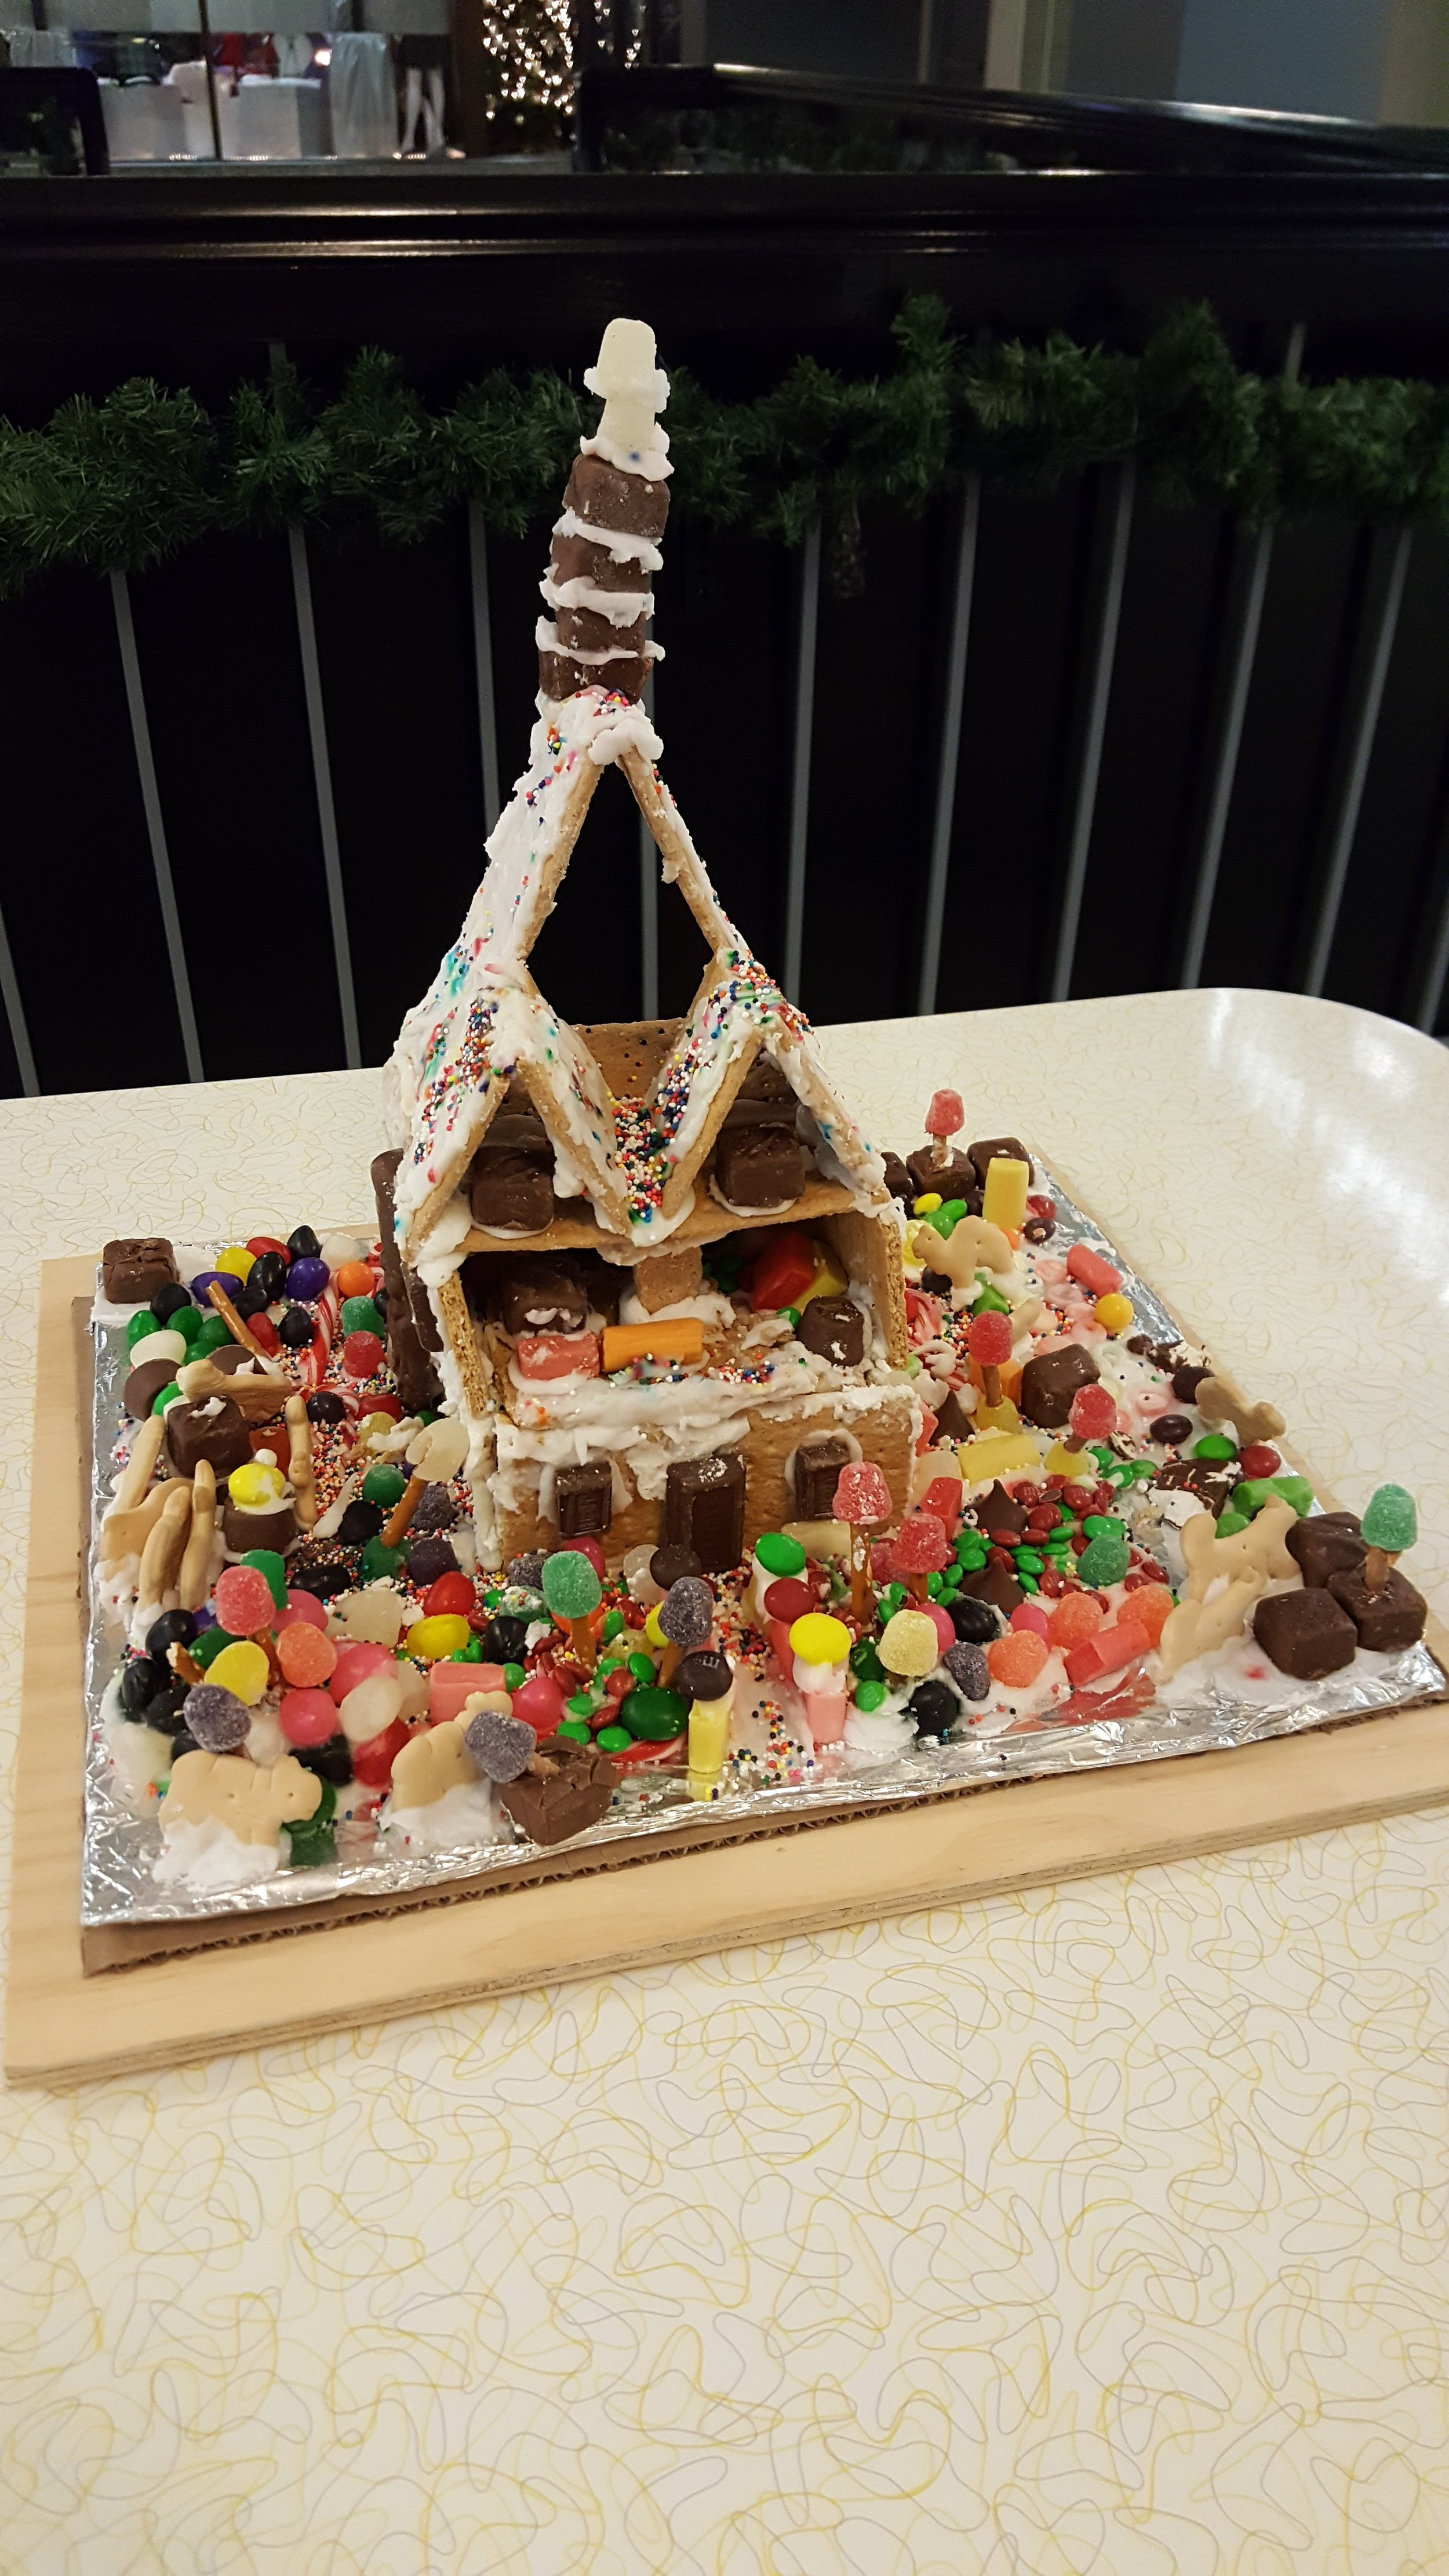 #6 Kade & Annika's Amazing Gingerbread HQ